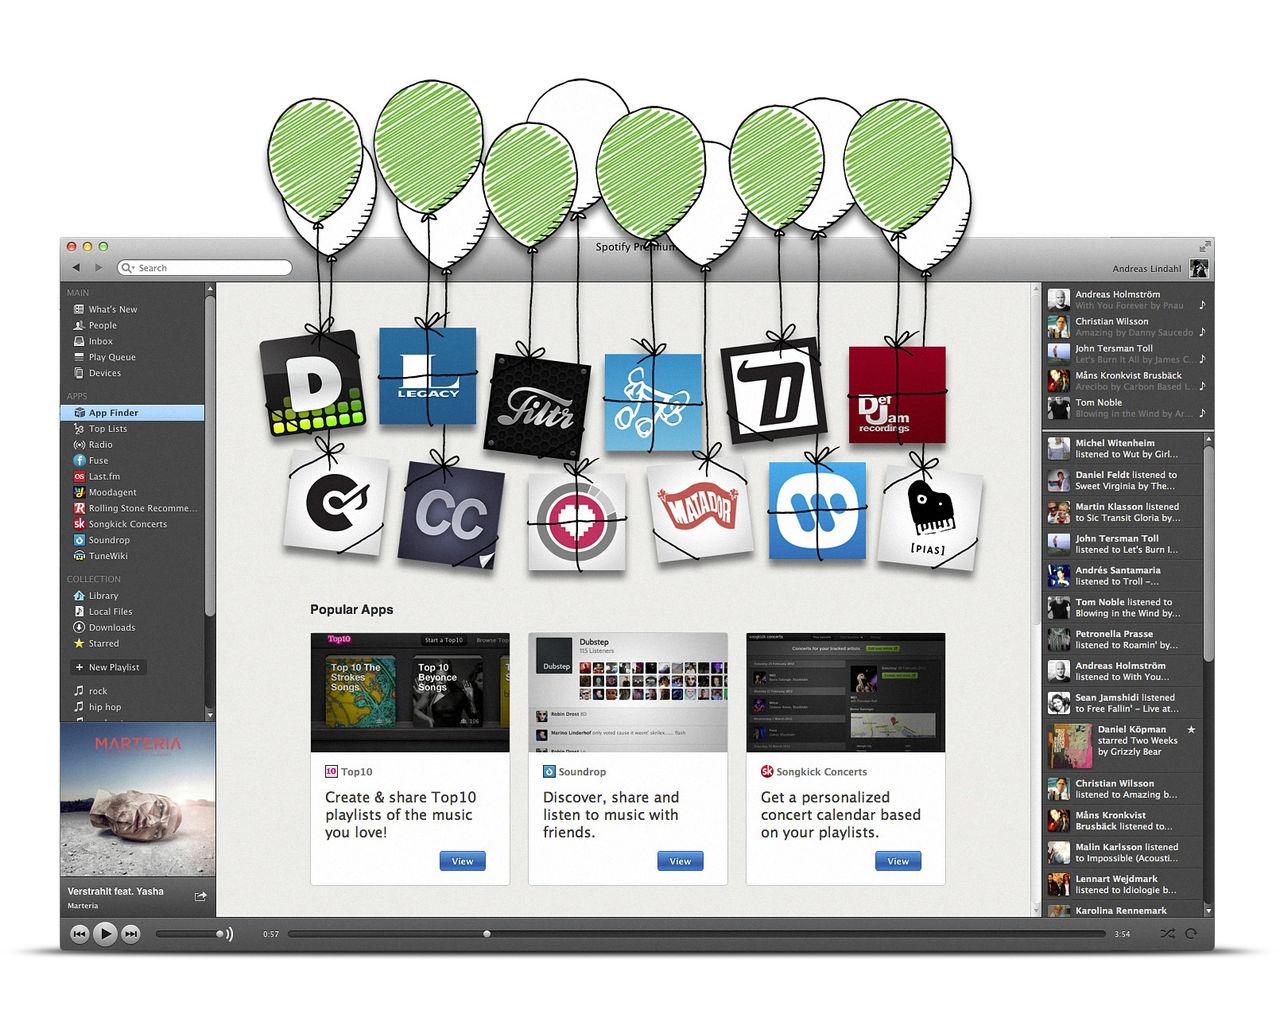 Spotify lanserar nya appar